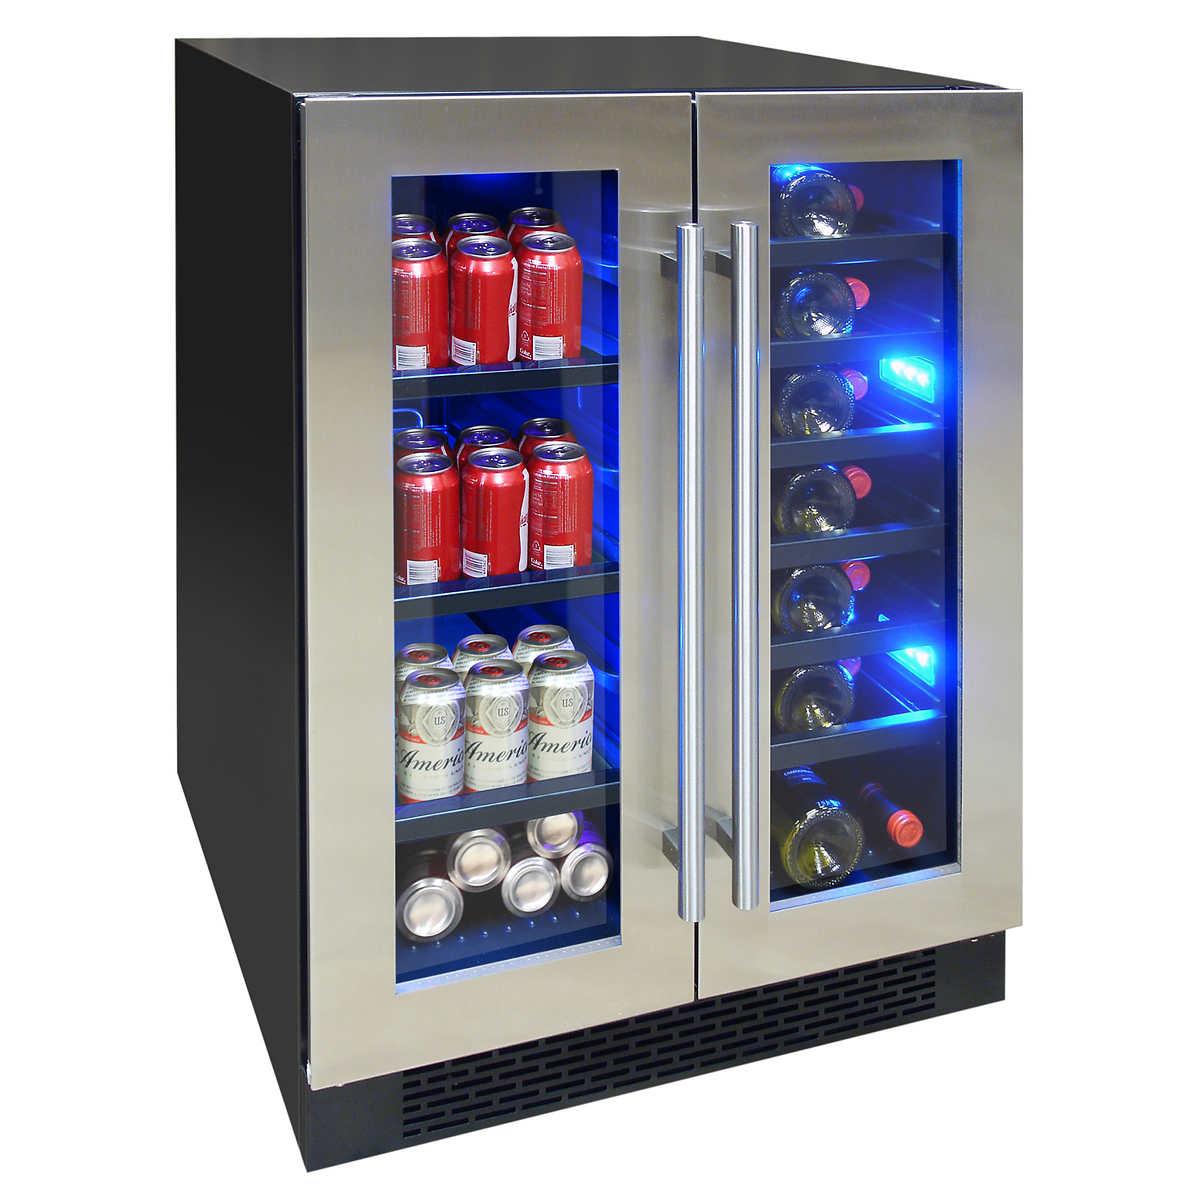 wine cellars  coolers  costco - element by vinotemp dualzone wine and beverage center elbwc